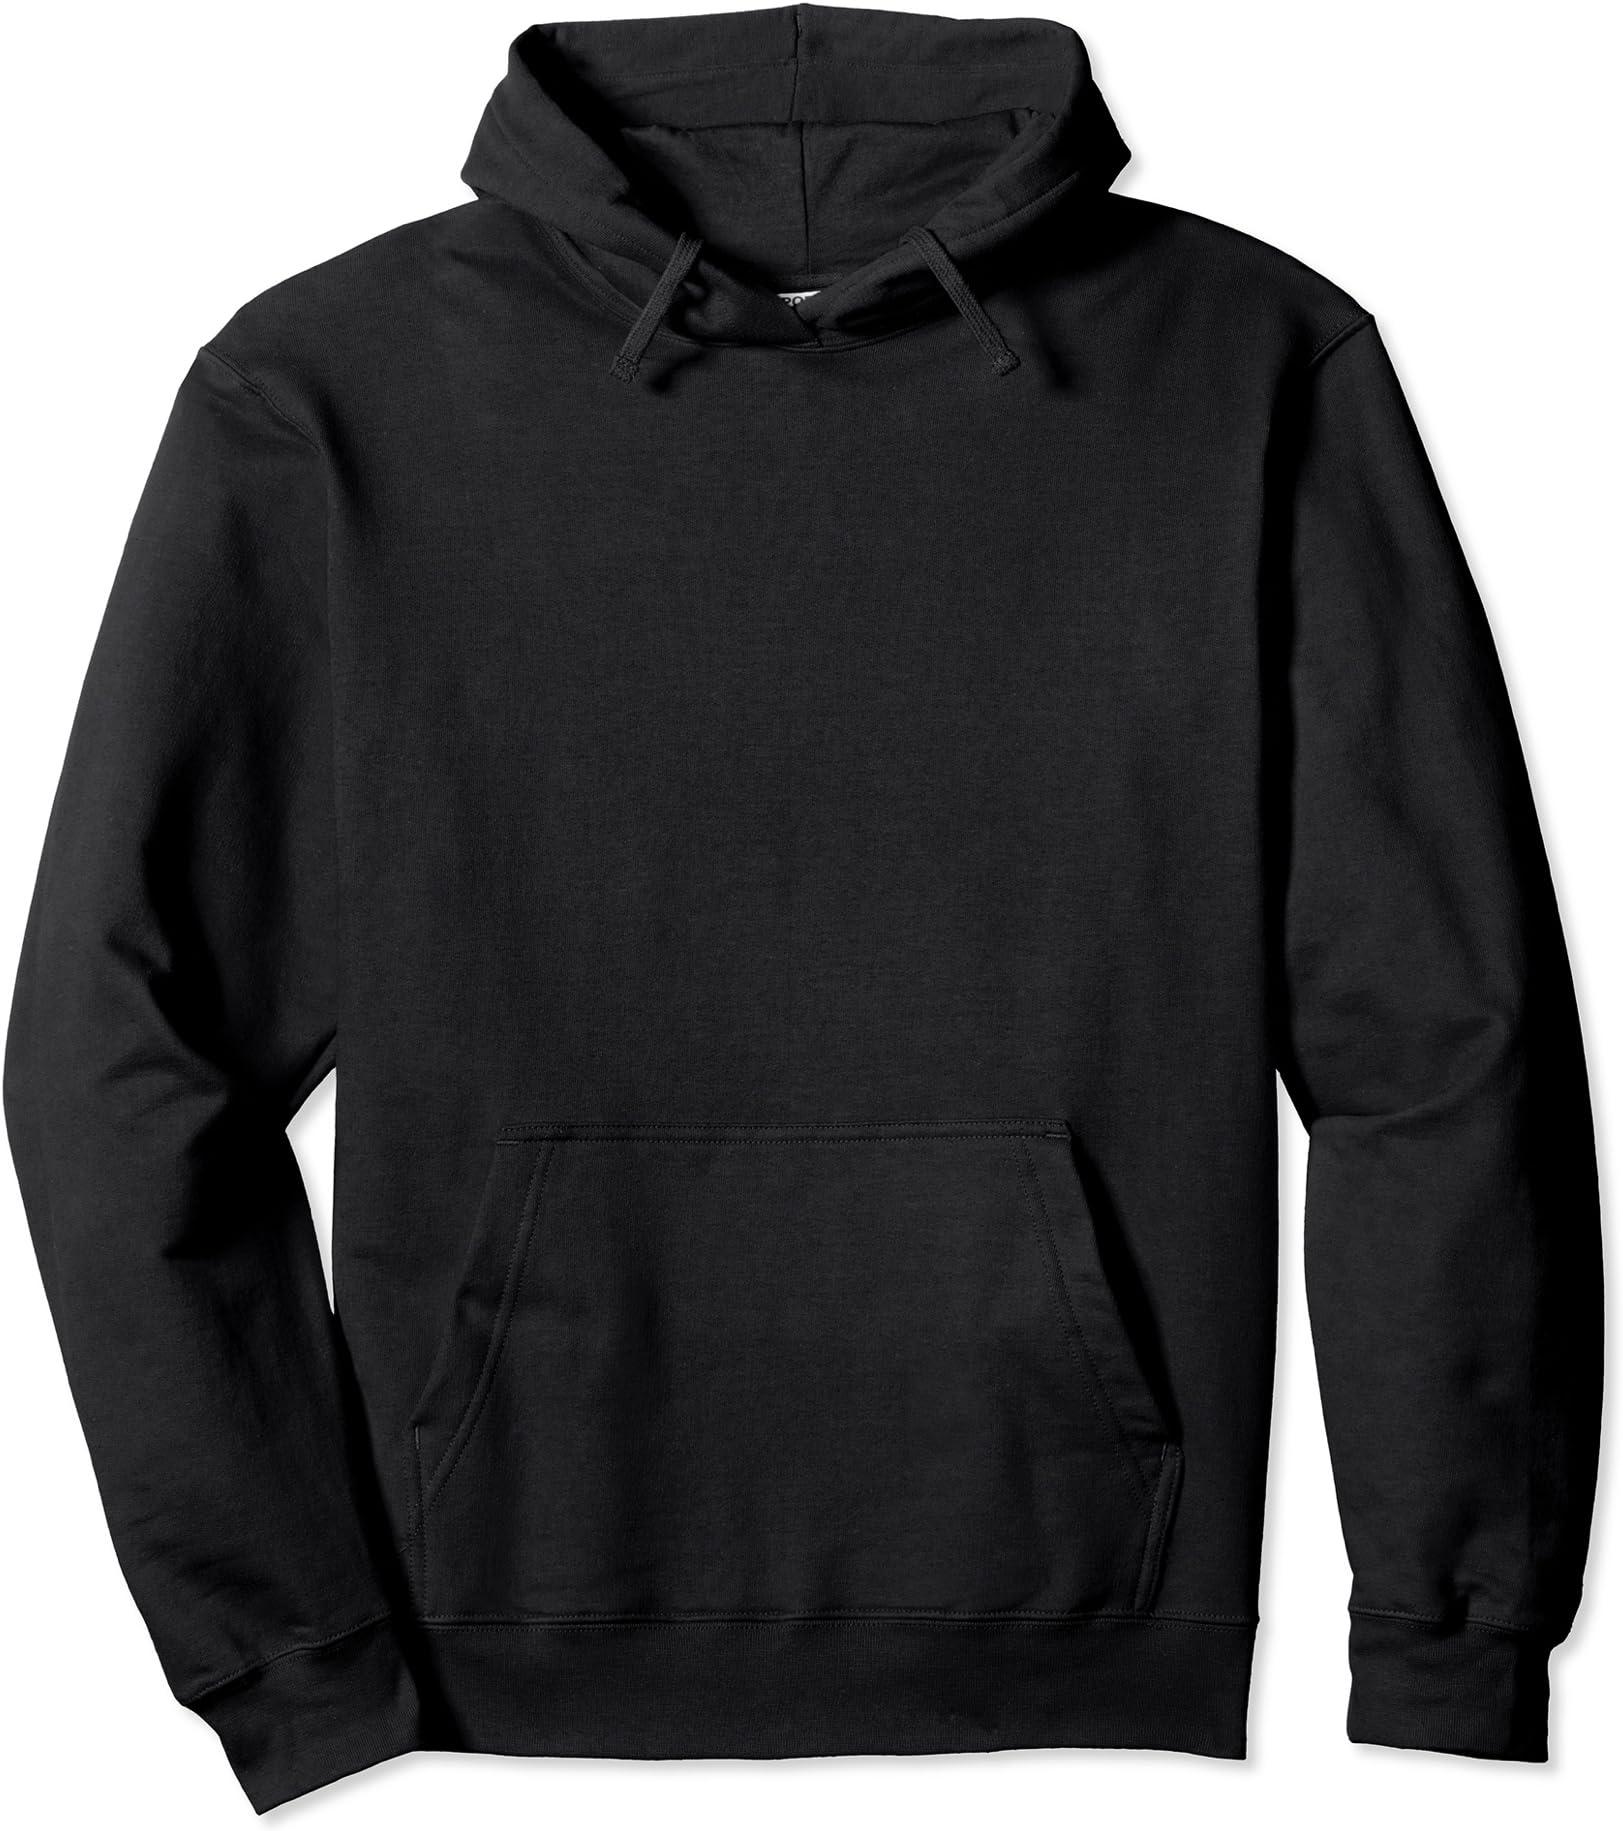 Bob Marley Sweatshirt Sweater Jersey Jumper Mens Womens Rasta Gift Music